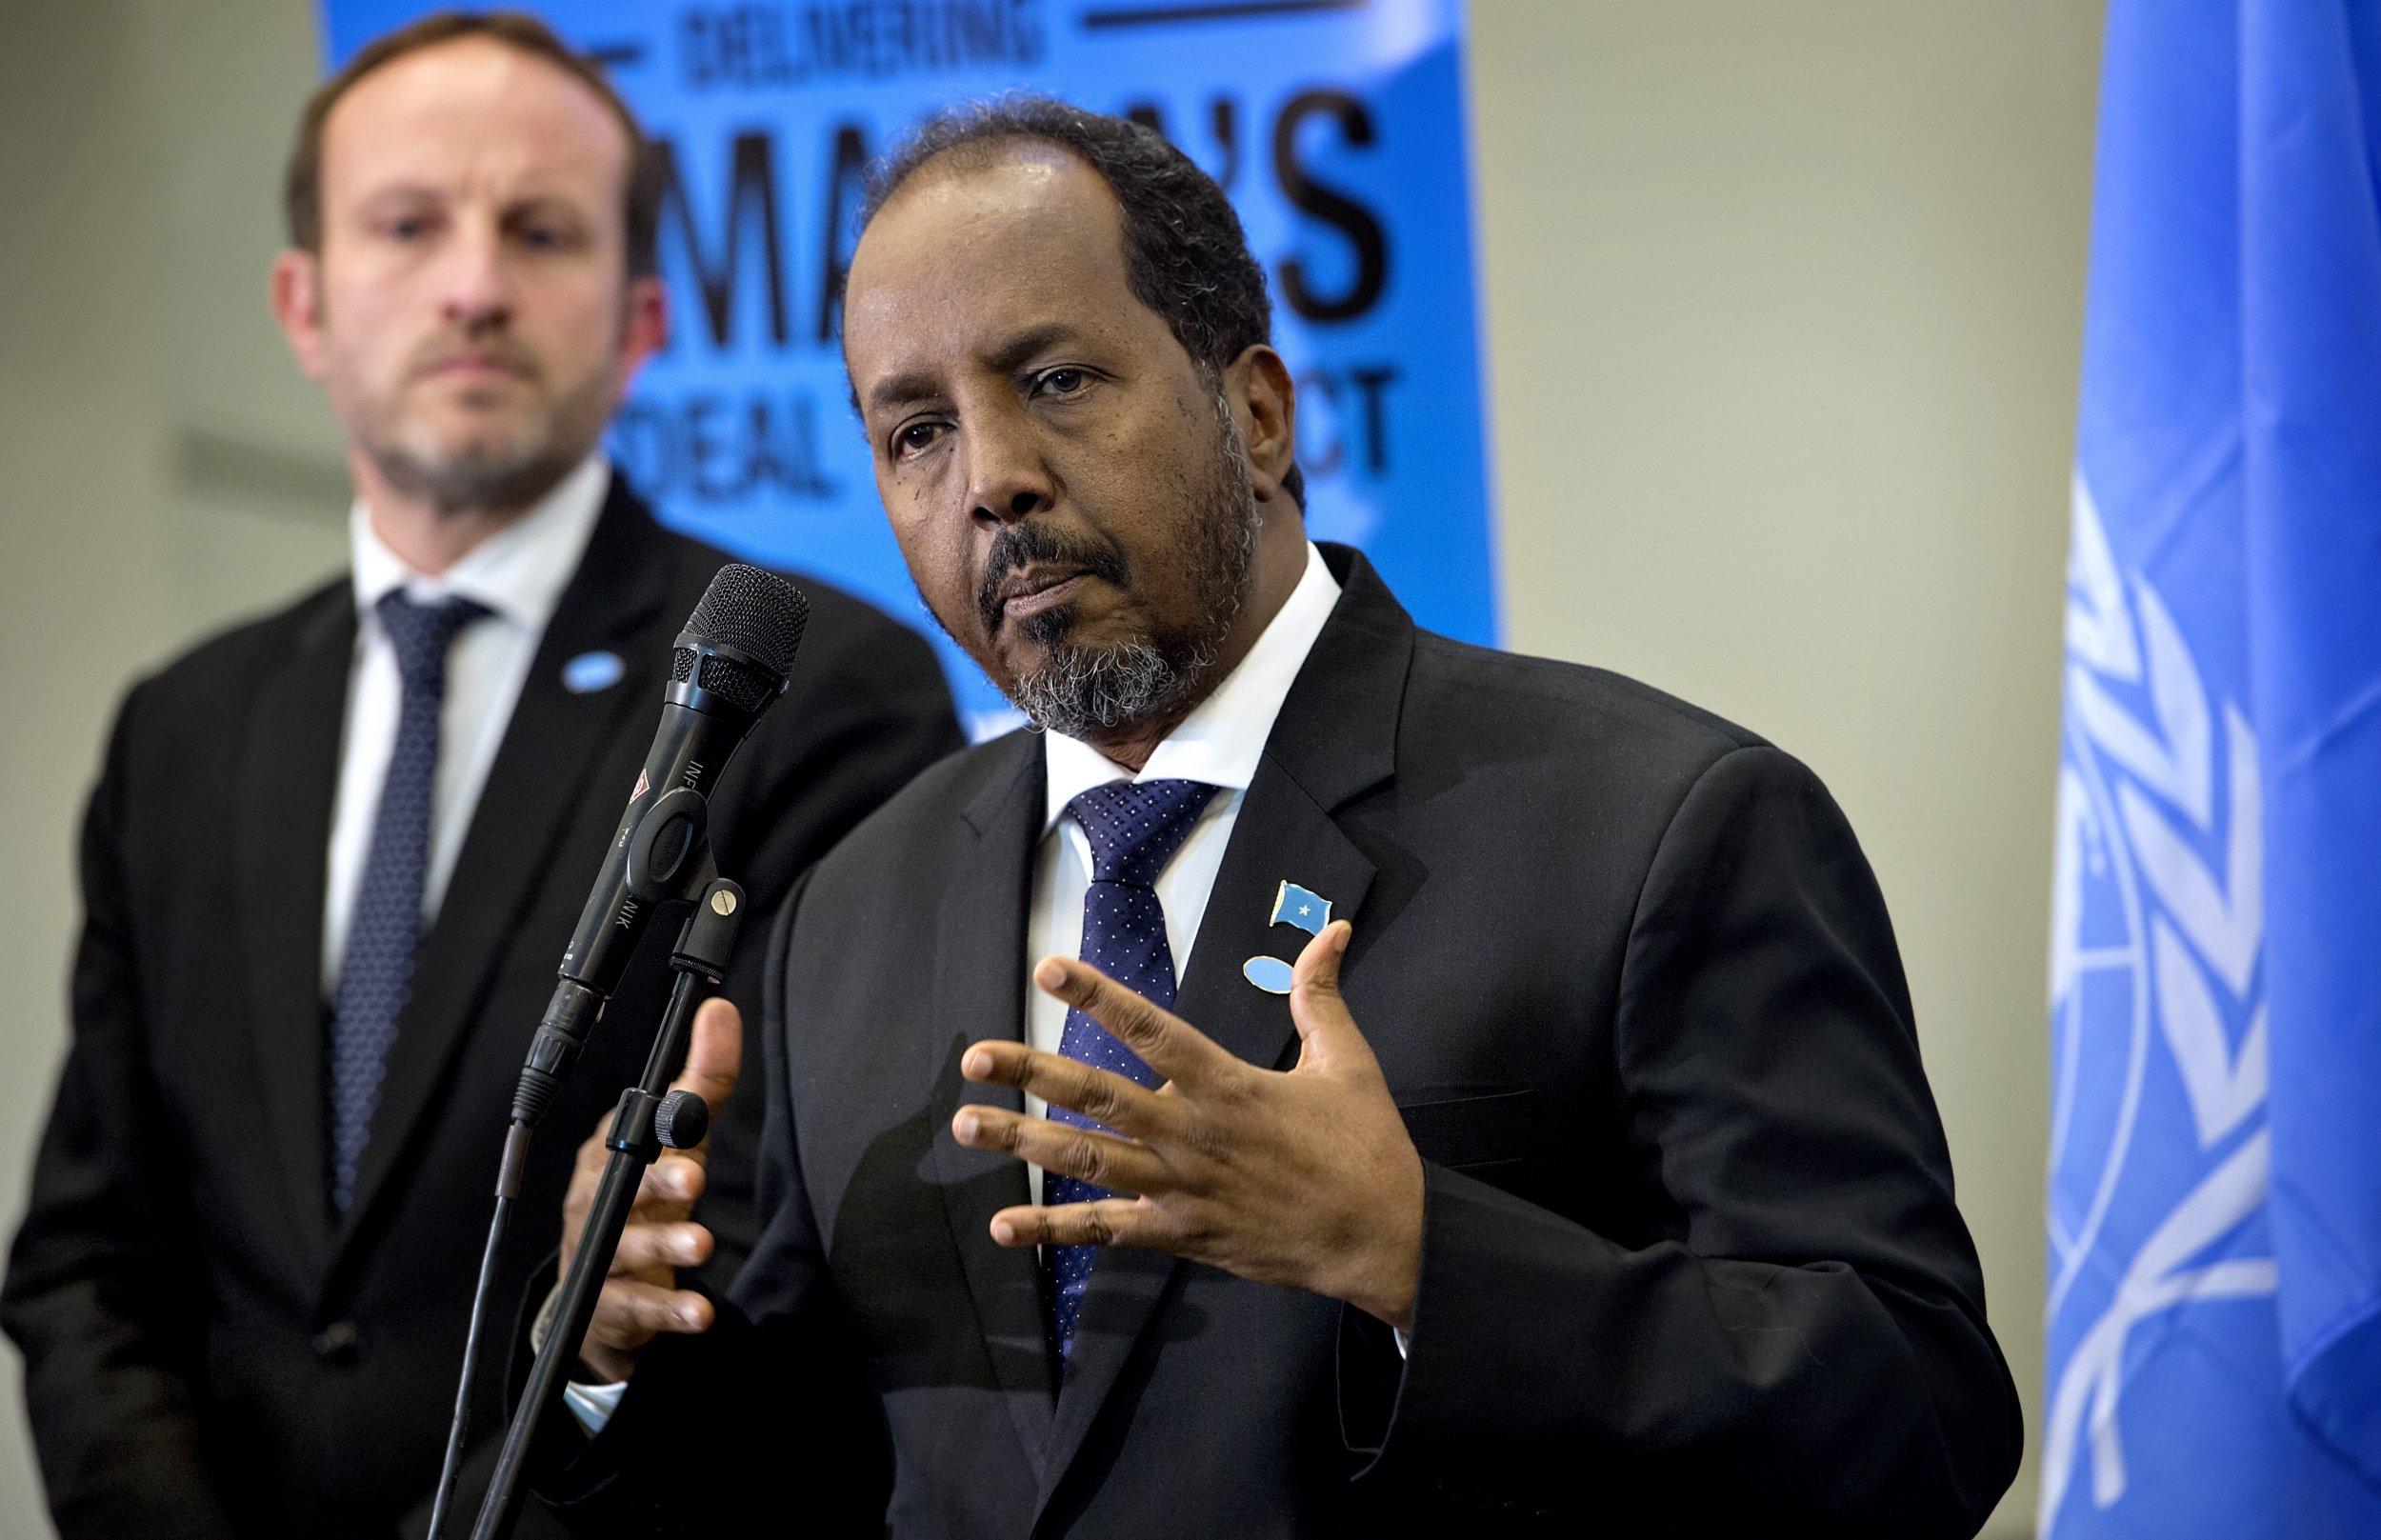 Exclusive: Somalia President Hassan Sheikh Mohamud Tells Newsweek